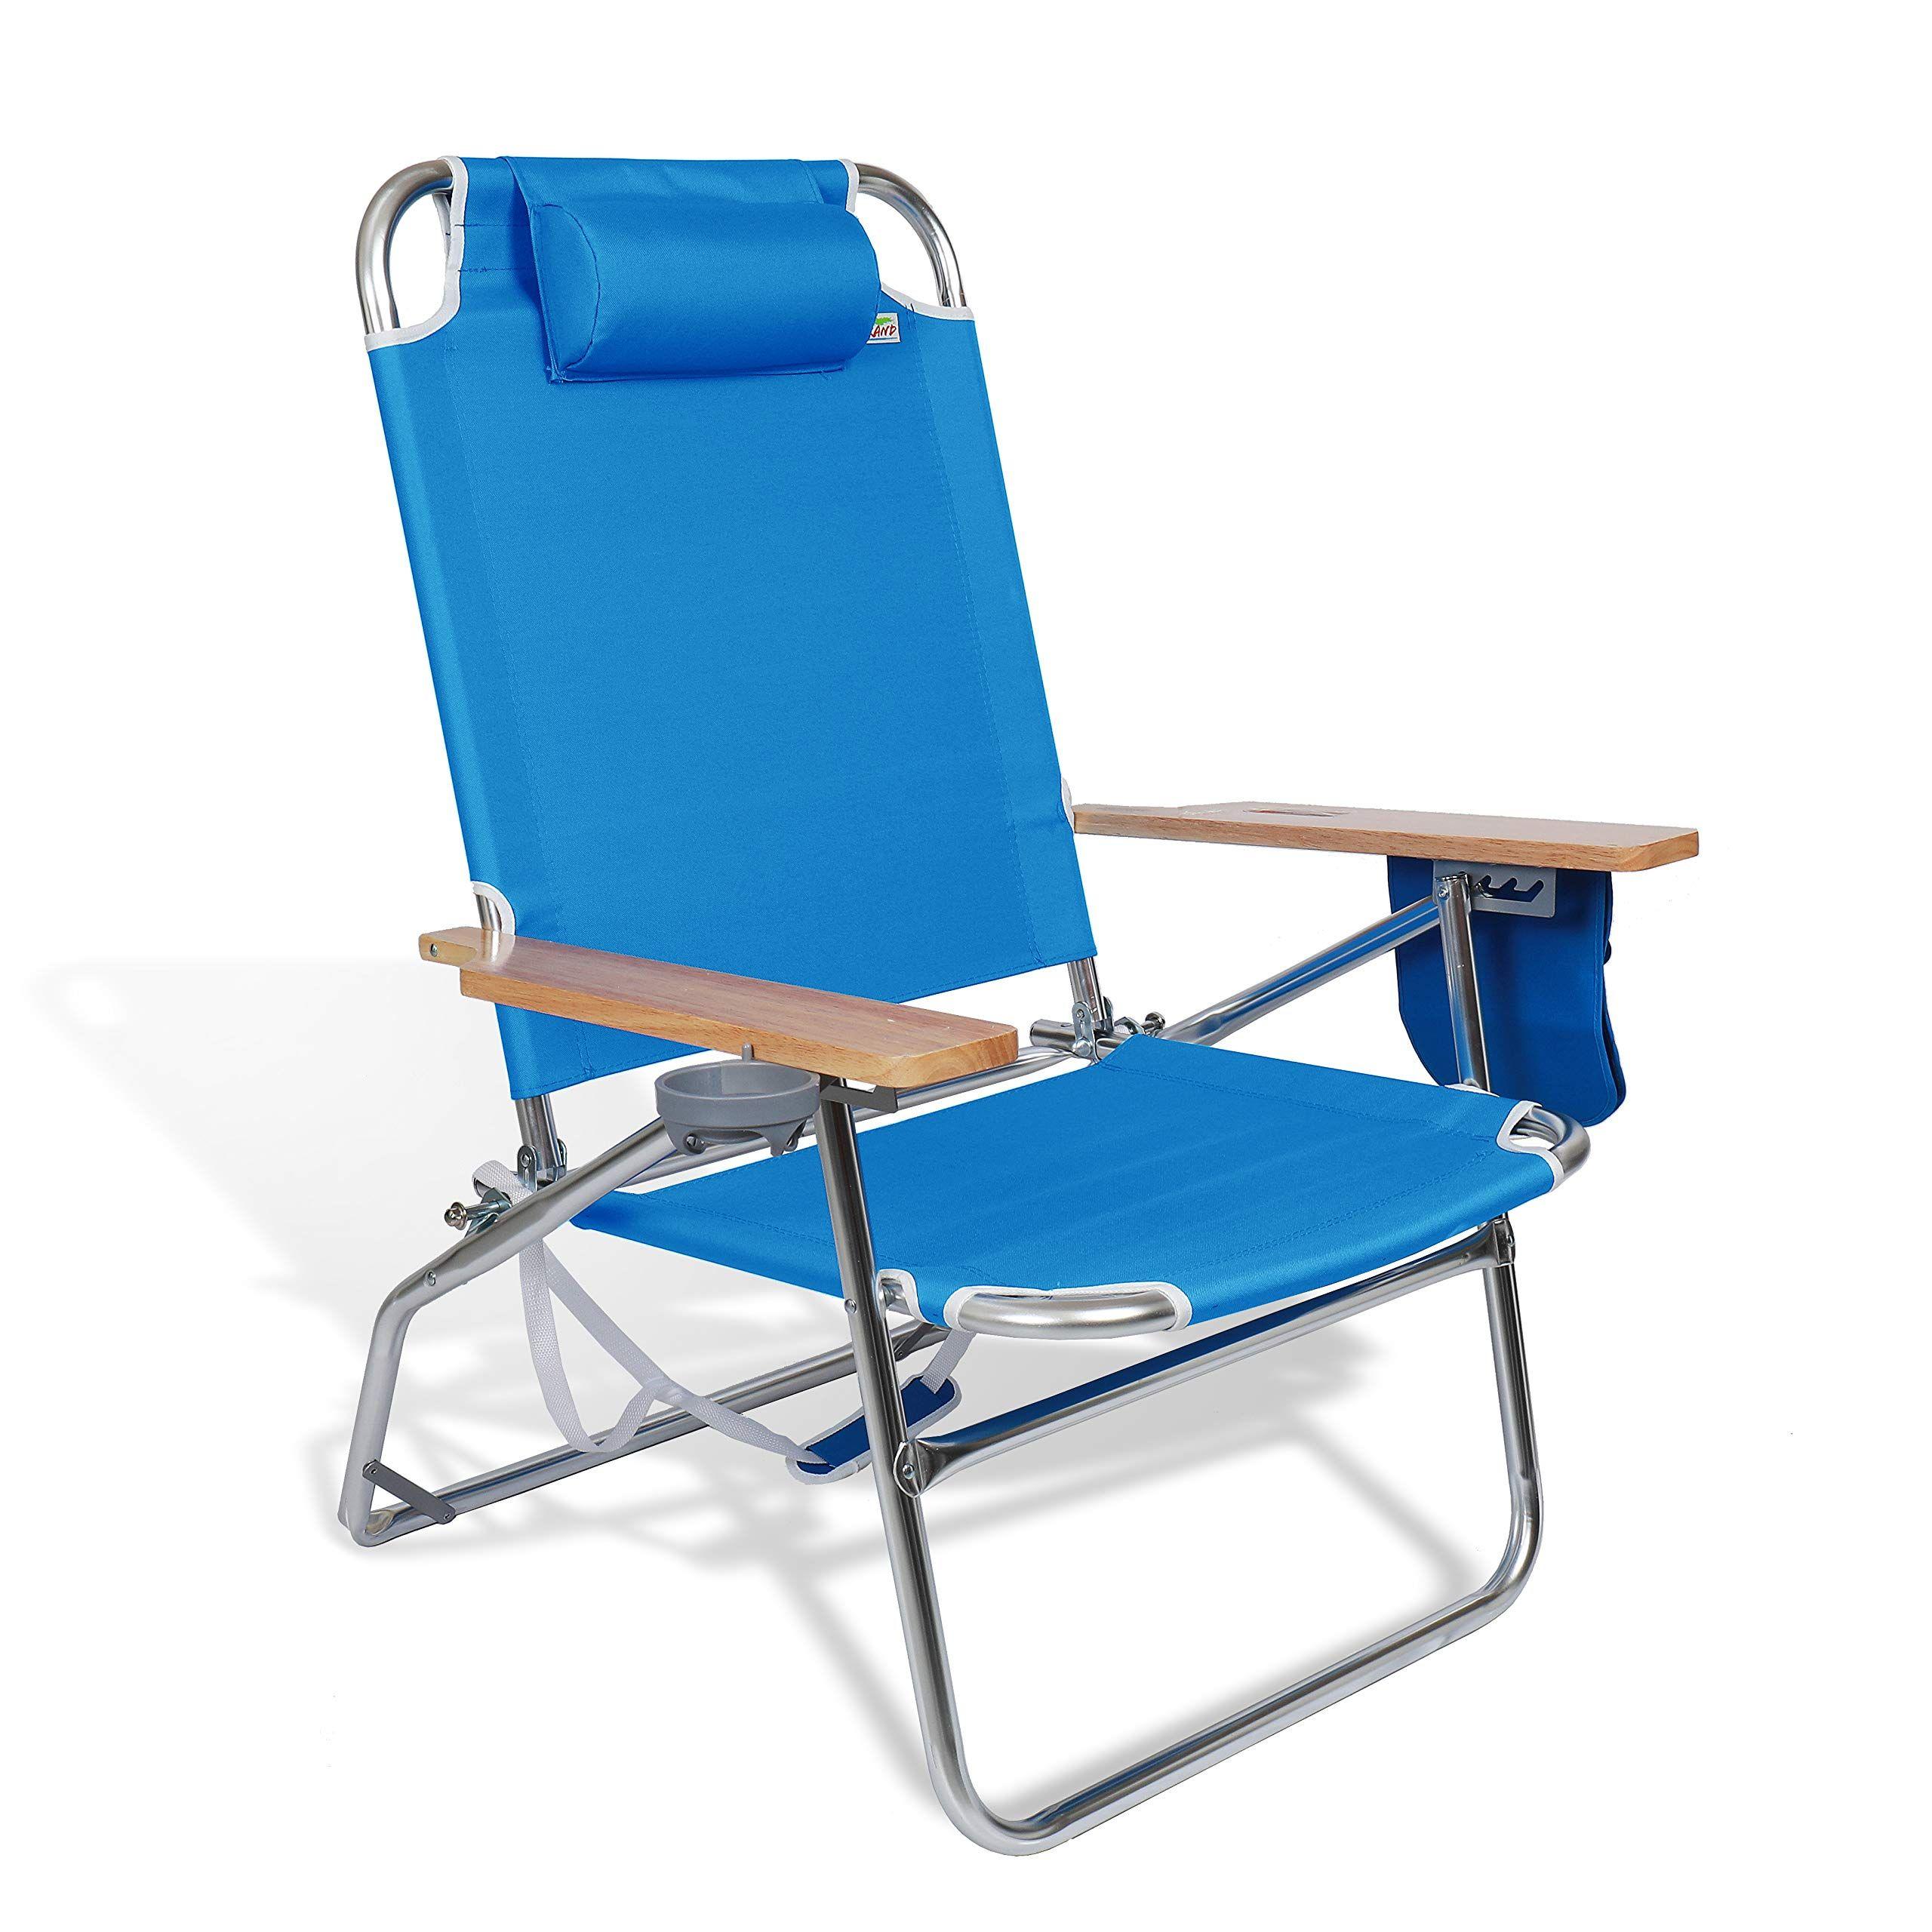 690grand High Capacity Beach Jumbo Chair 500lbs Folding Seat Big And Tall Outdoor Camping Storage Pouch And Cup Holder Outdoor Chairs Outdoor Outdoor Storage